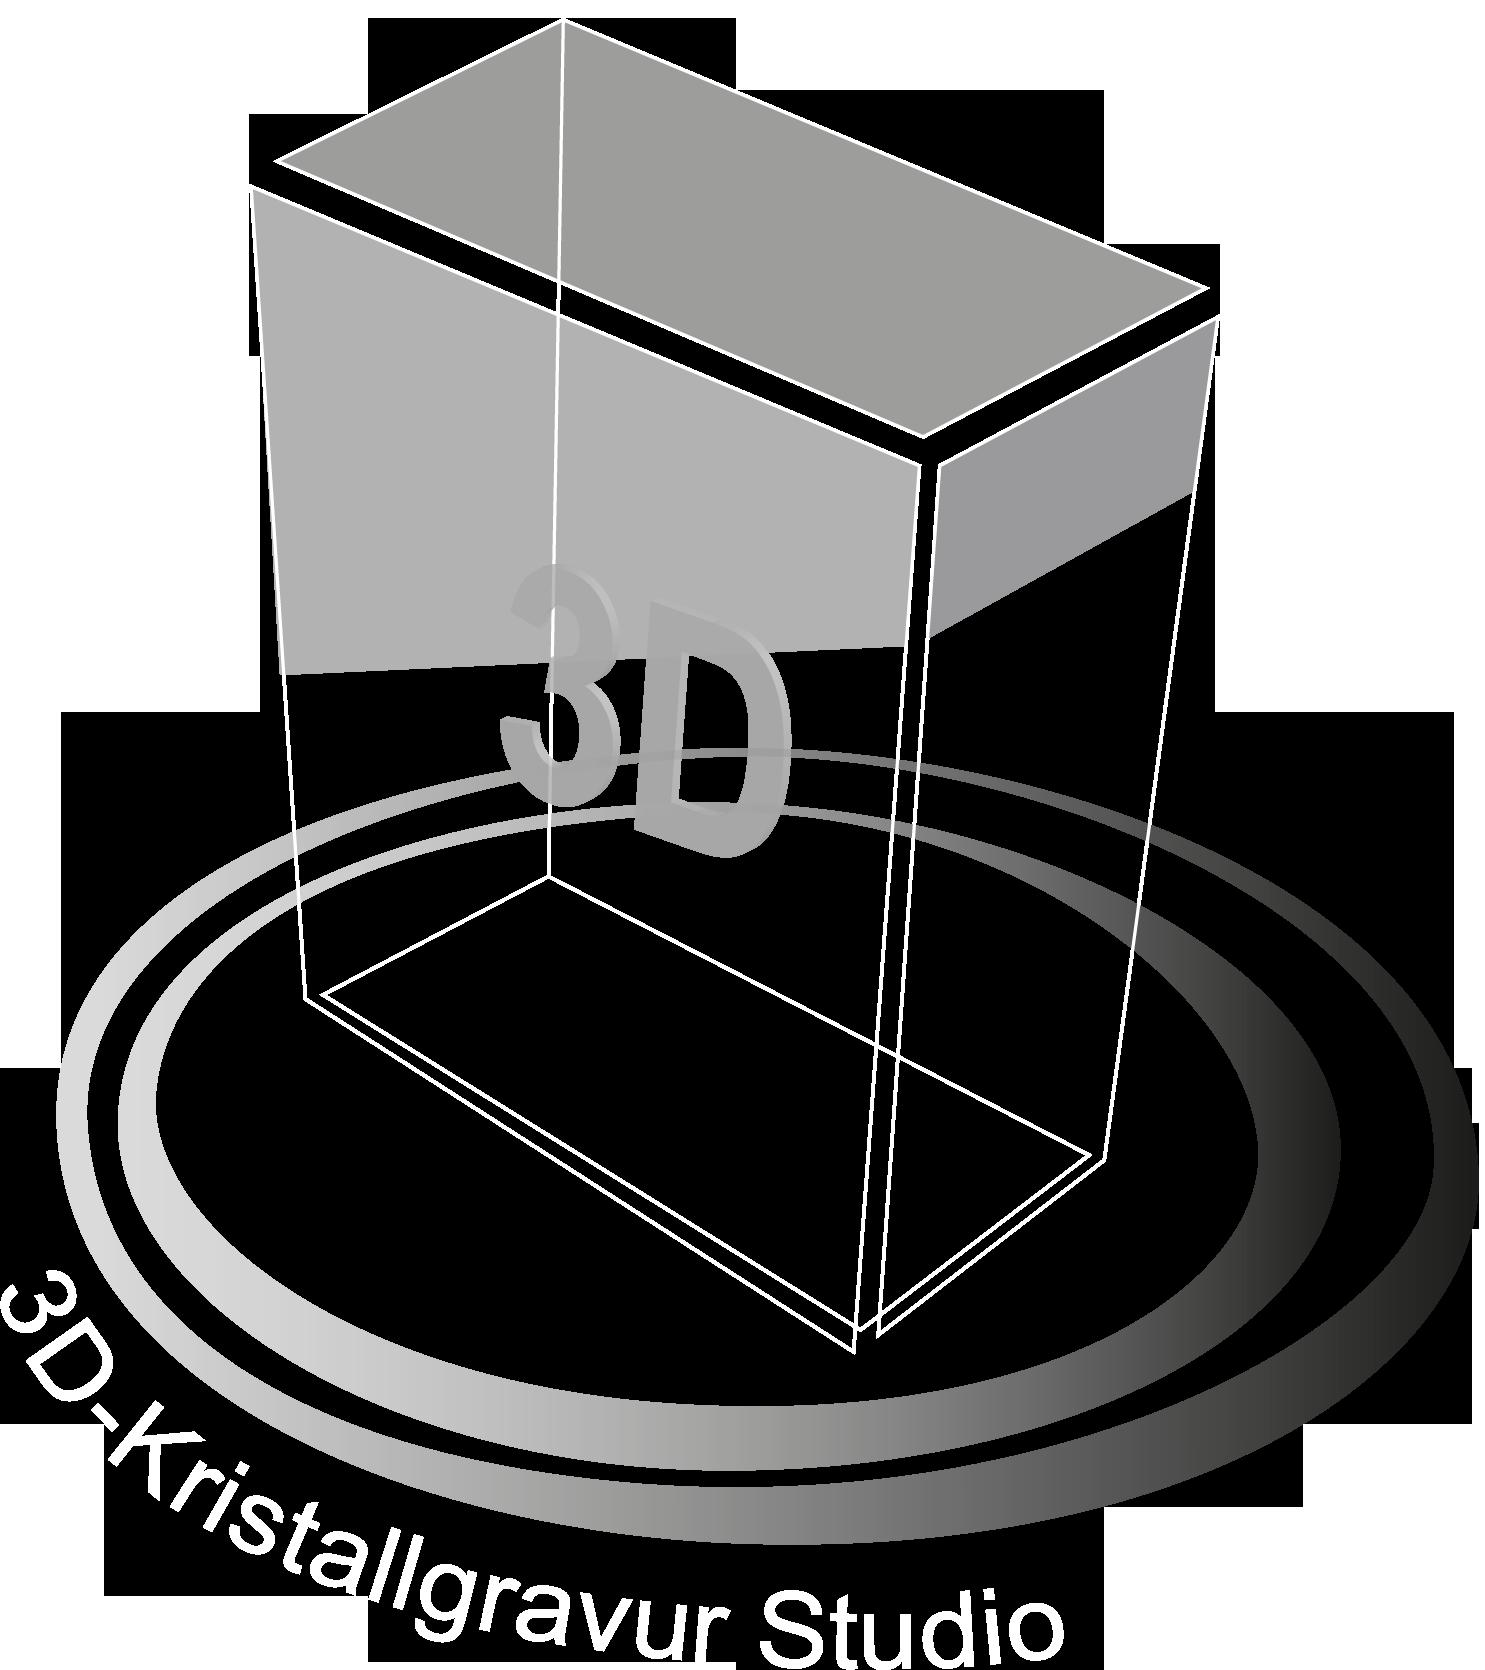 Logo Image 3D Kristallgravur Studio